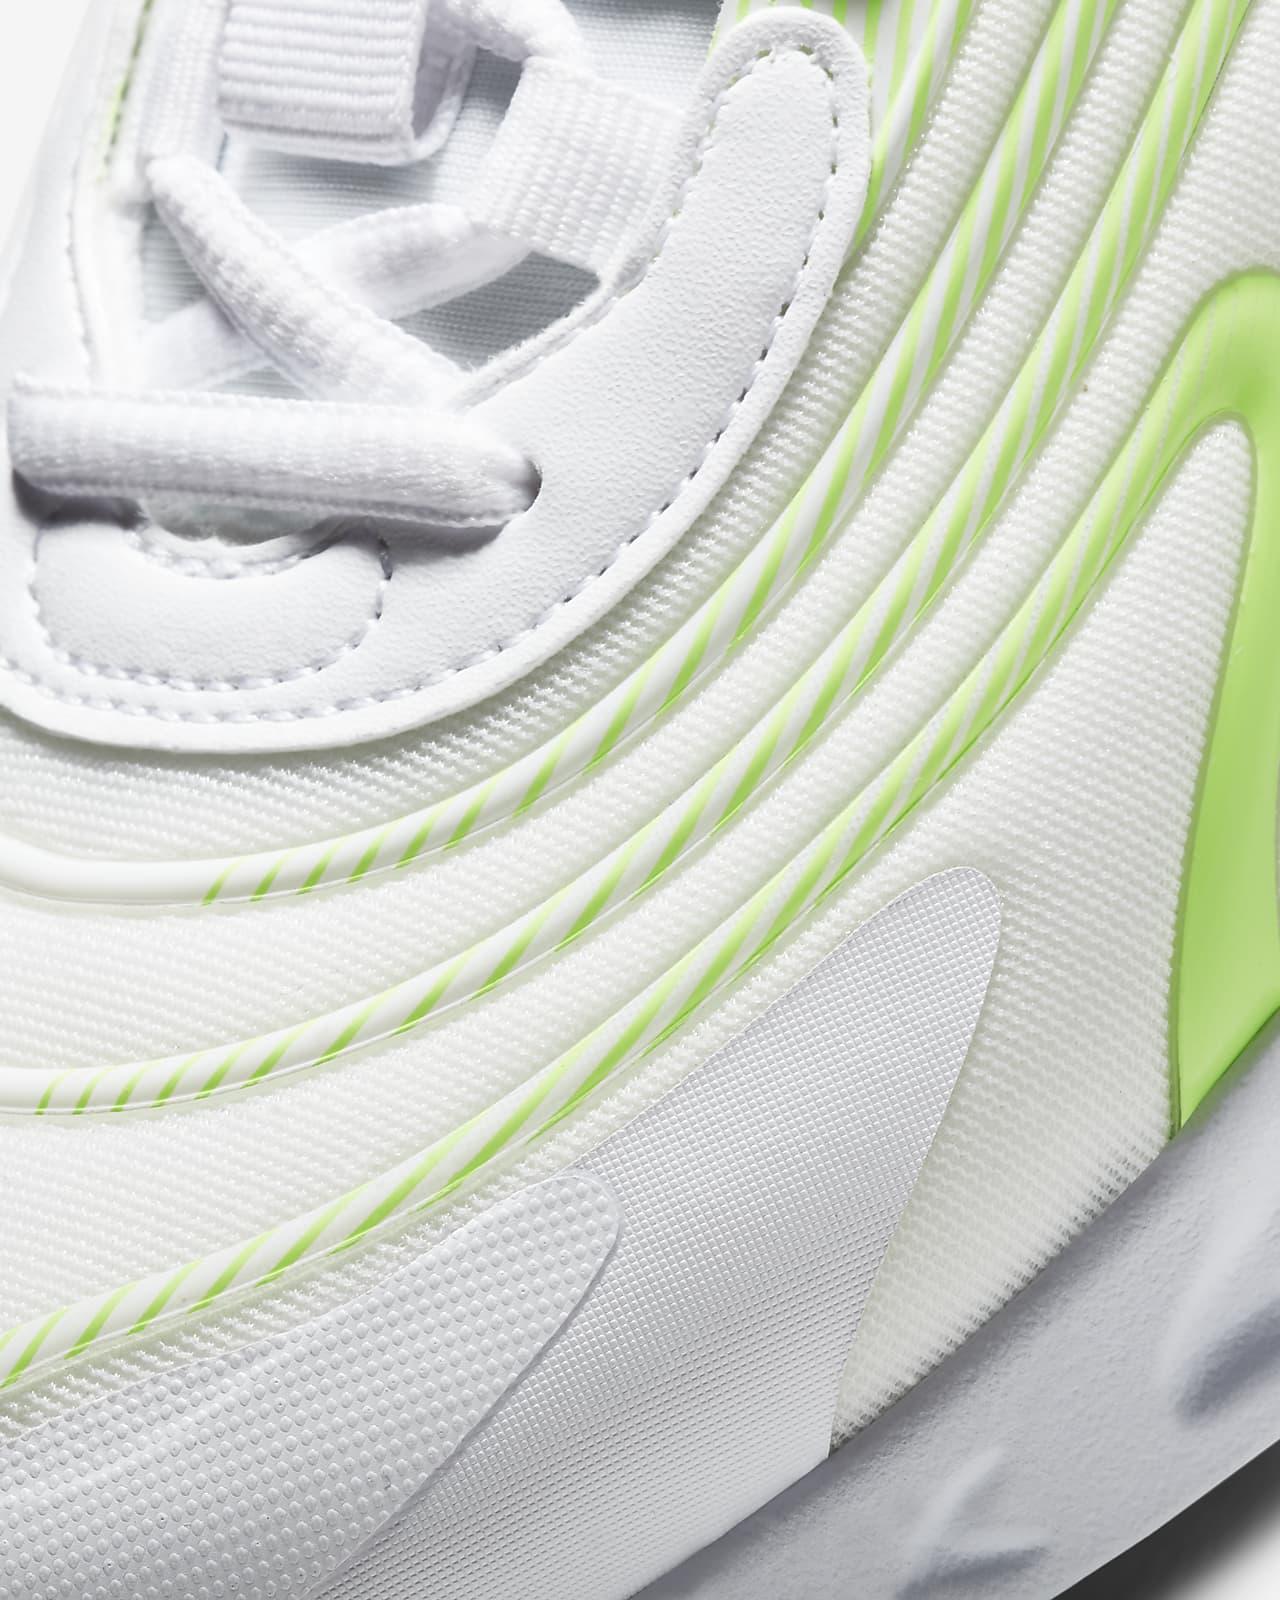 nike 270 blanco con verde